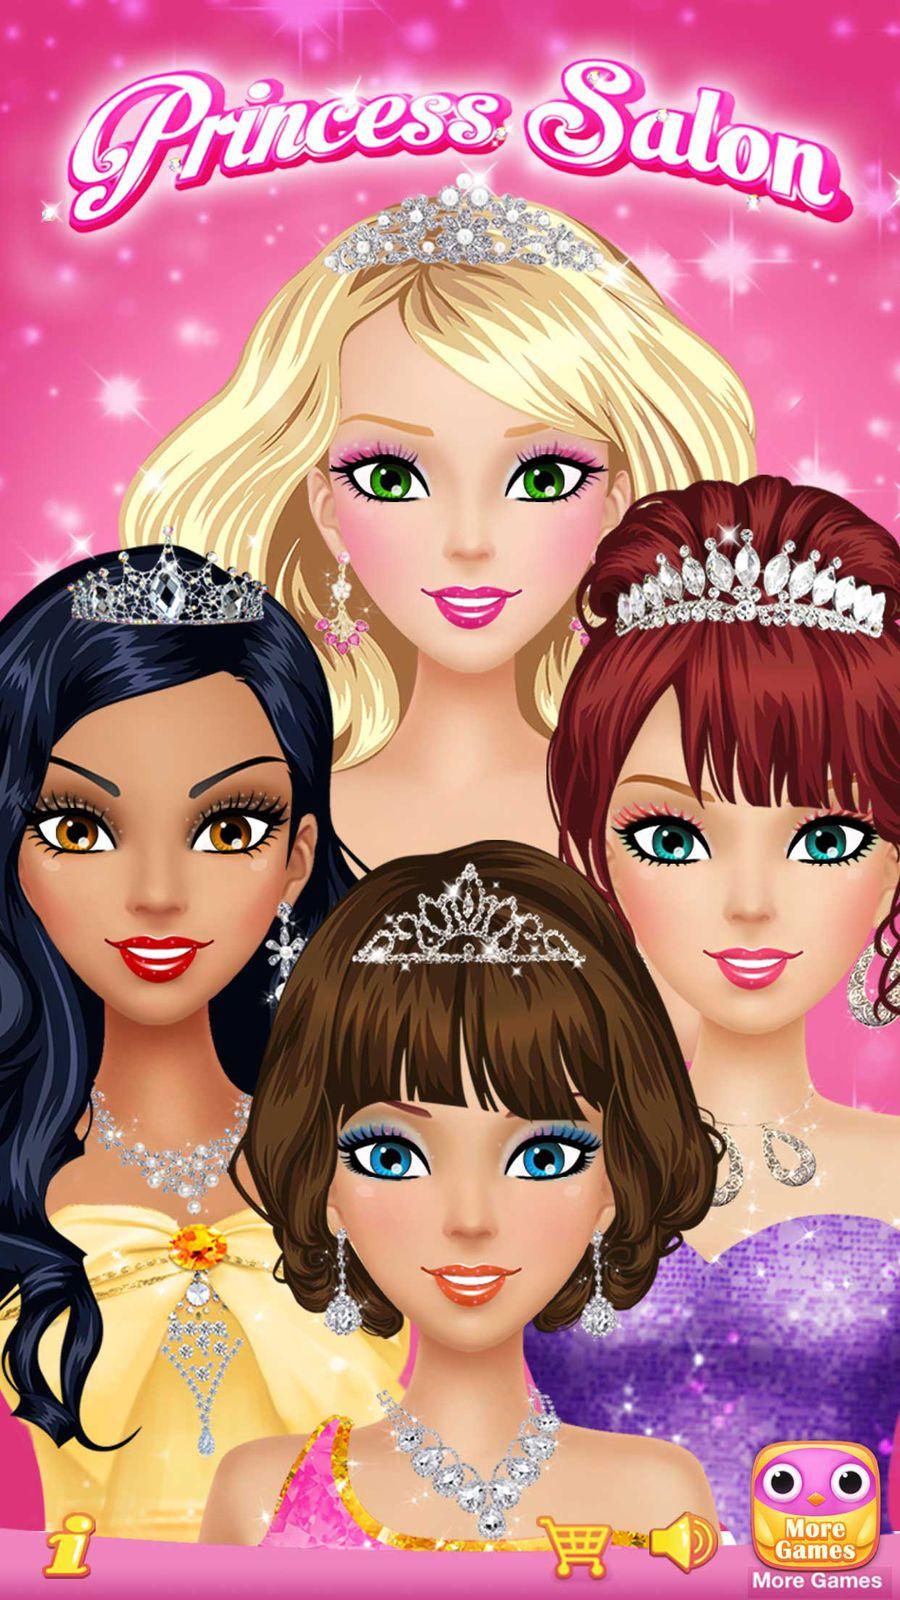 Princess Salon鈩?20 Girls Makeup, Dressup and Makeover